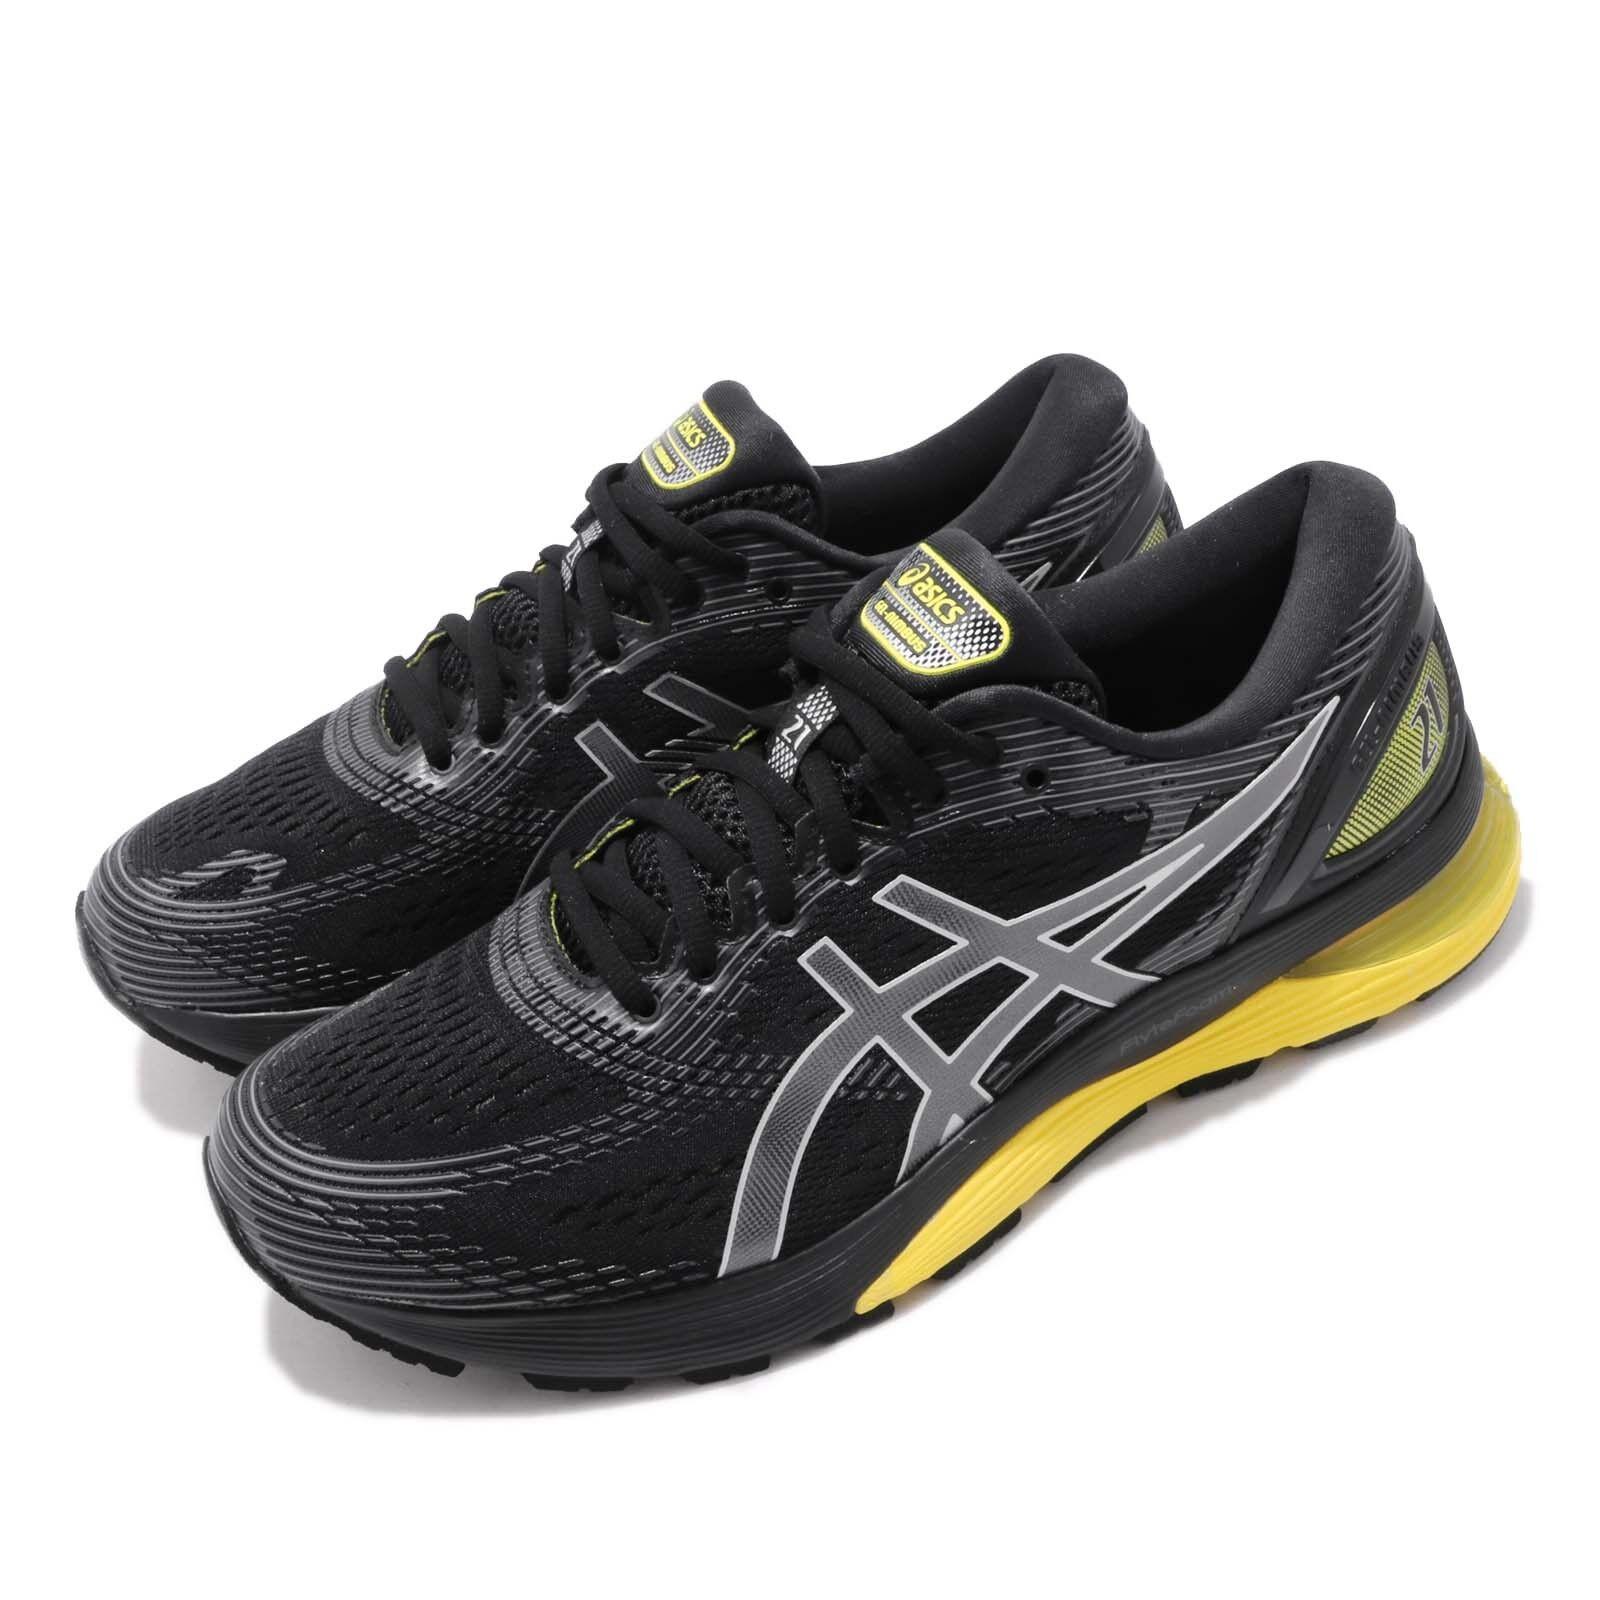 Asics Asics Asics Gel Nimbus 21 2E Wide nero Lemon Spark Uomo Running scarpe 1011A172-003 ea7696